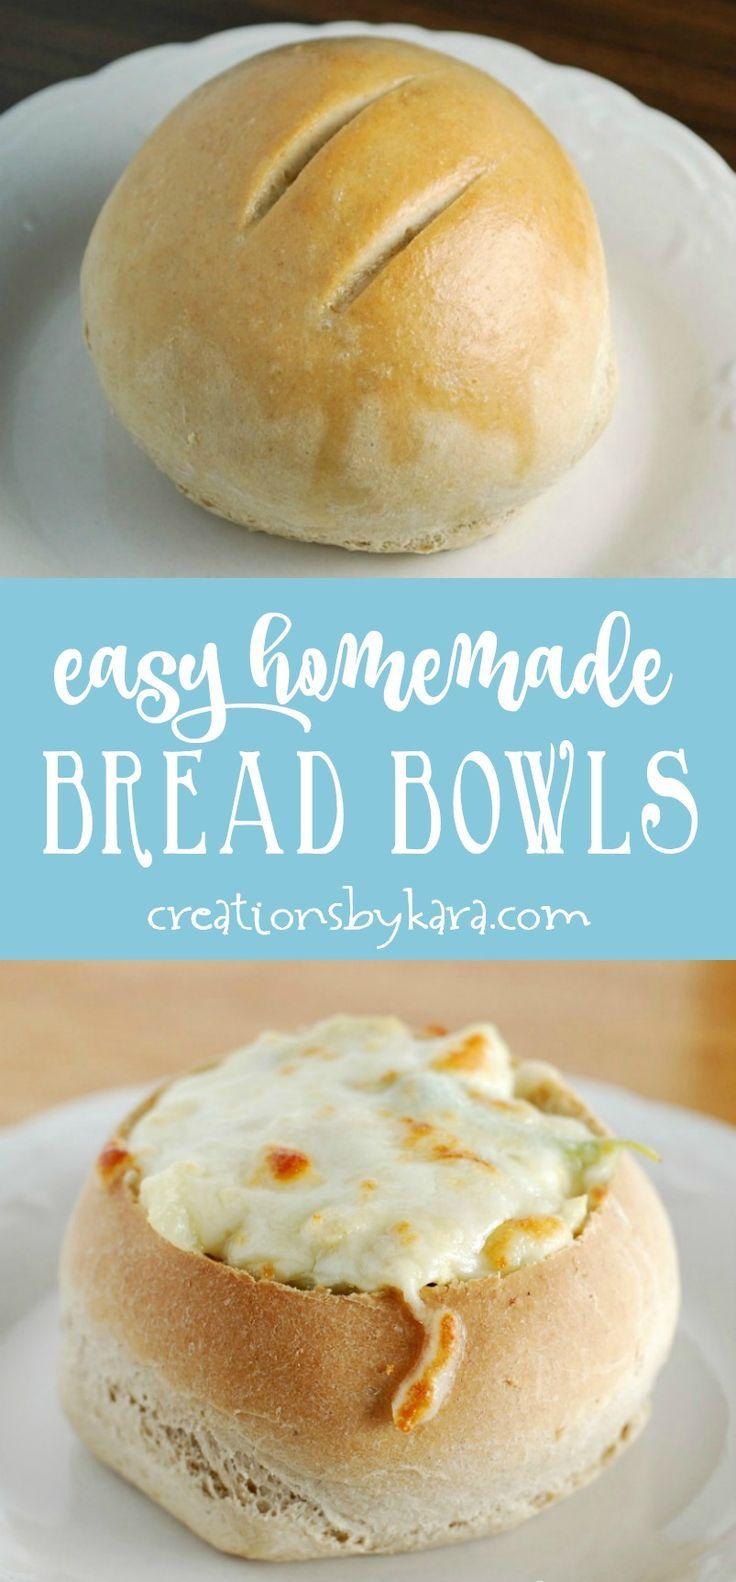 easy homemade bread bowls